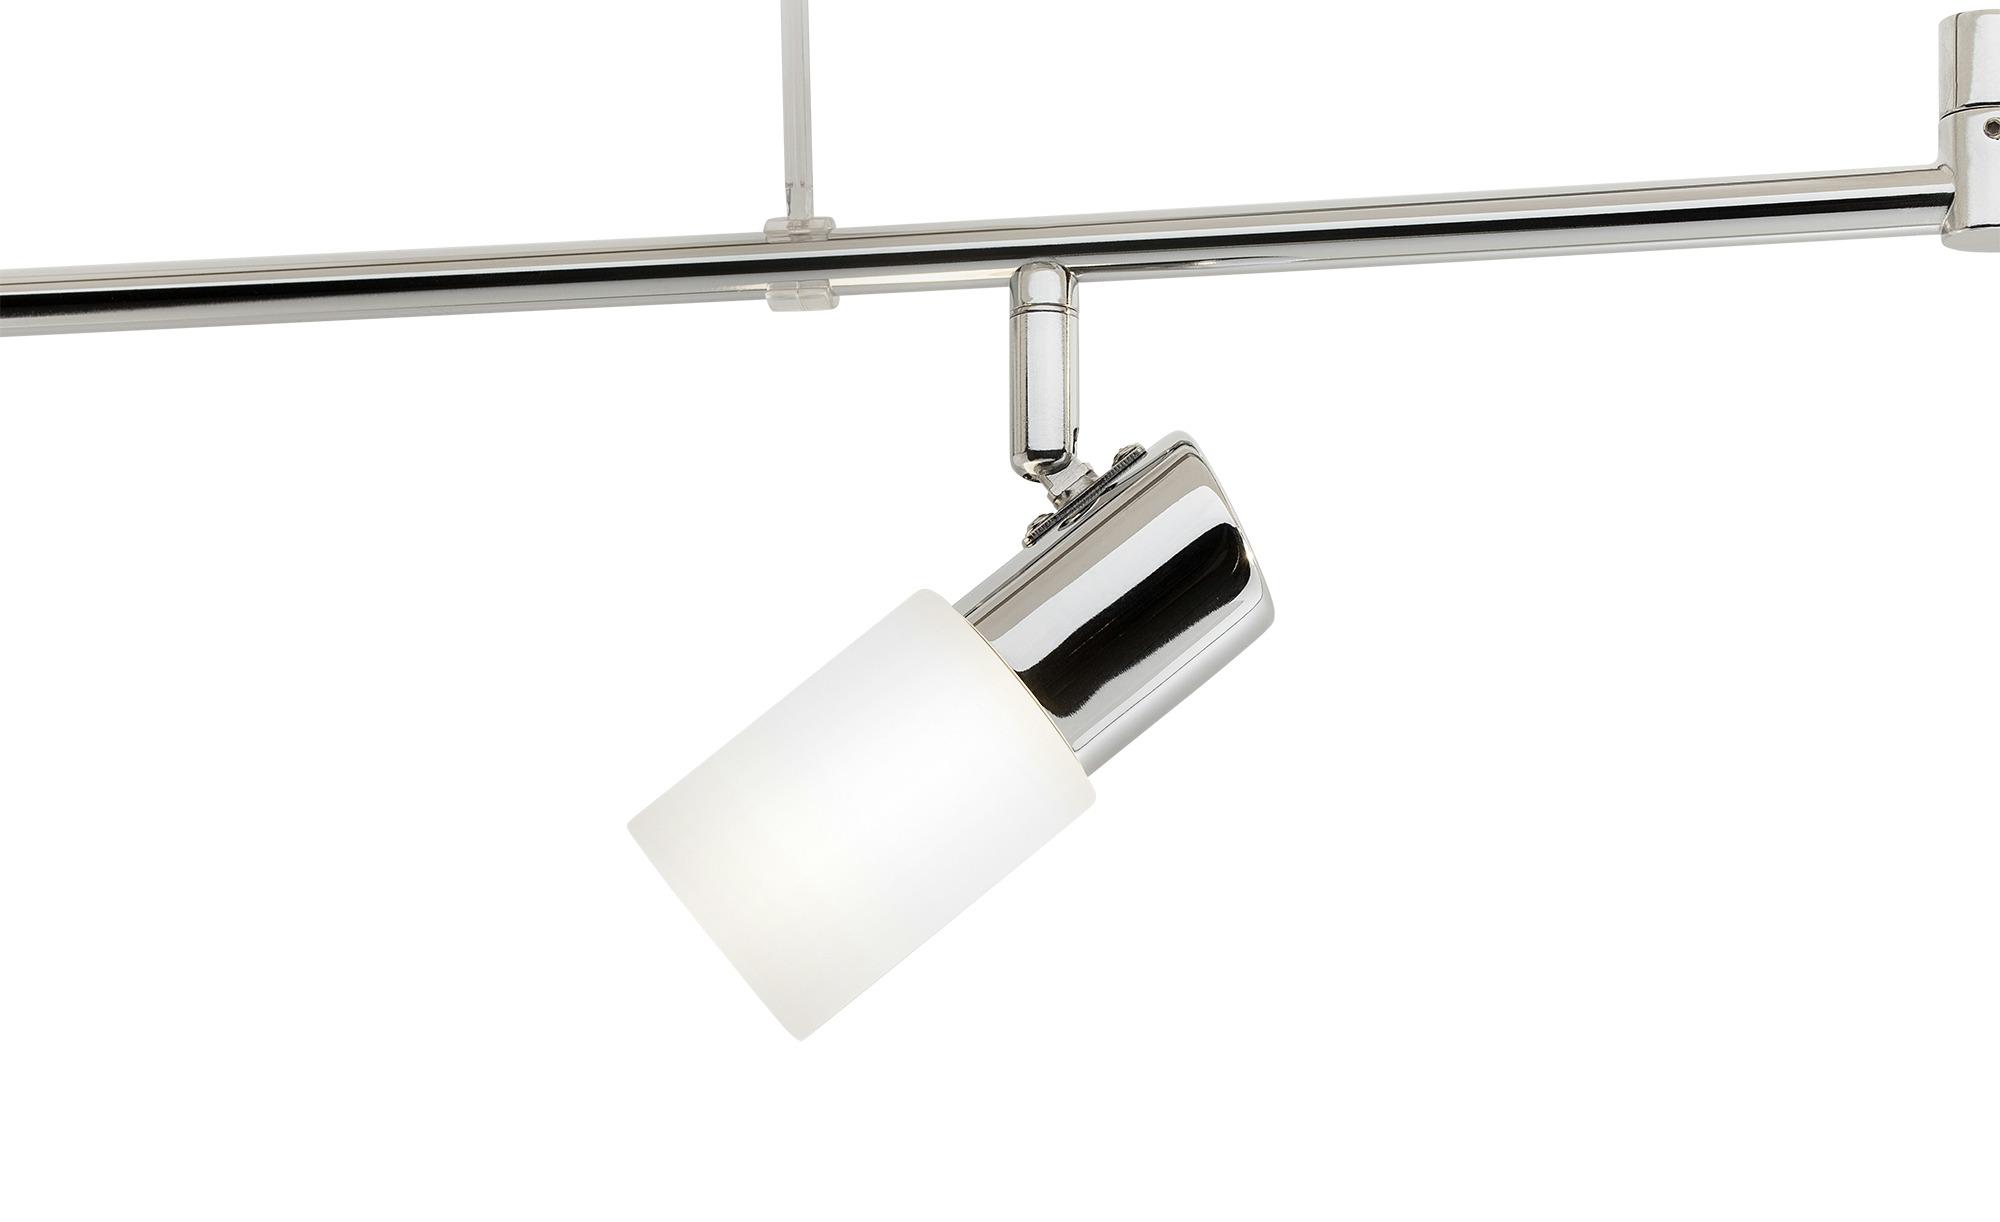 Trio LED-Deckenstrahler mit schwenkbaren Armen ¦ silber Lampen & Leuchten > LED-Leuchten > LED-Strahler & Spots - Höffner